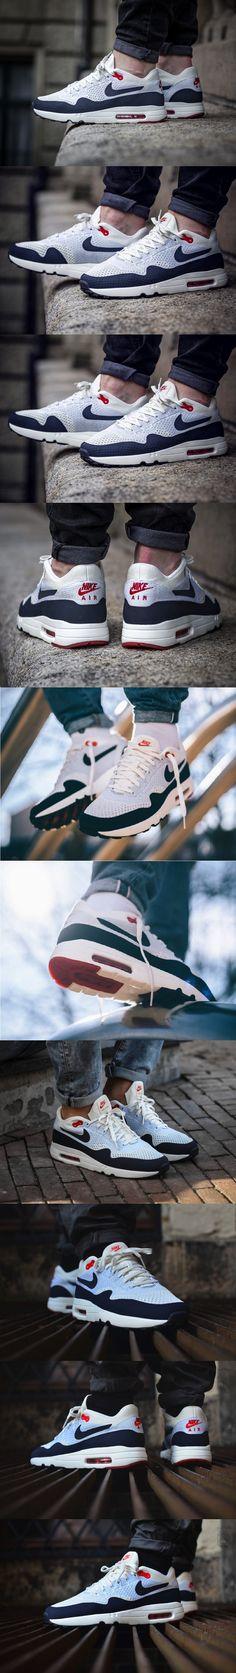 #Nike #Air #Max 1 #Ultra 2.0 #Flyknit OG #Obsidian